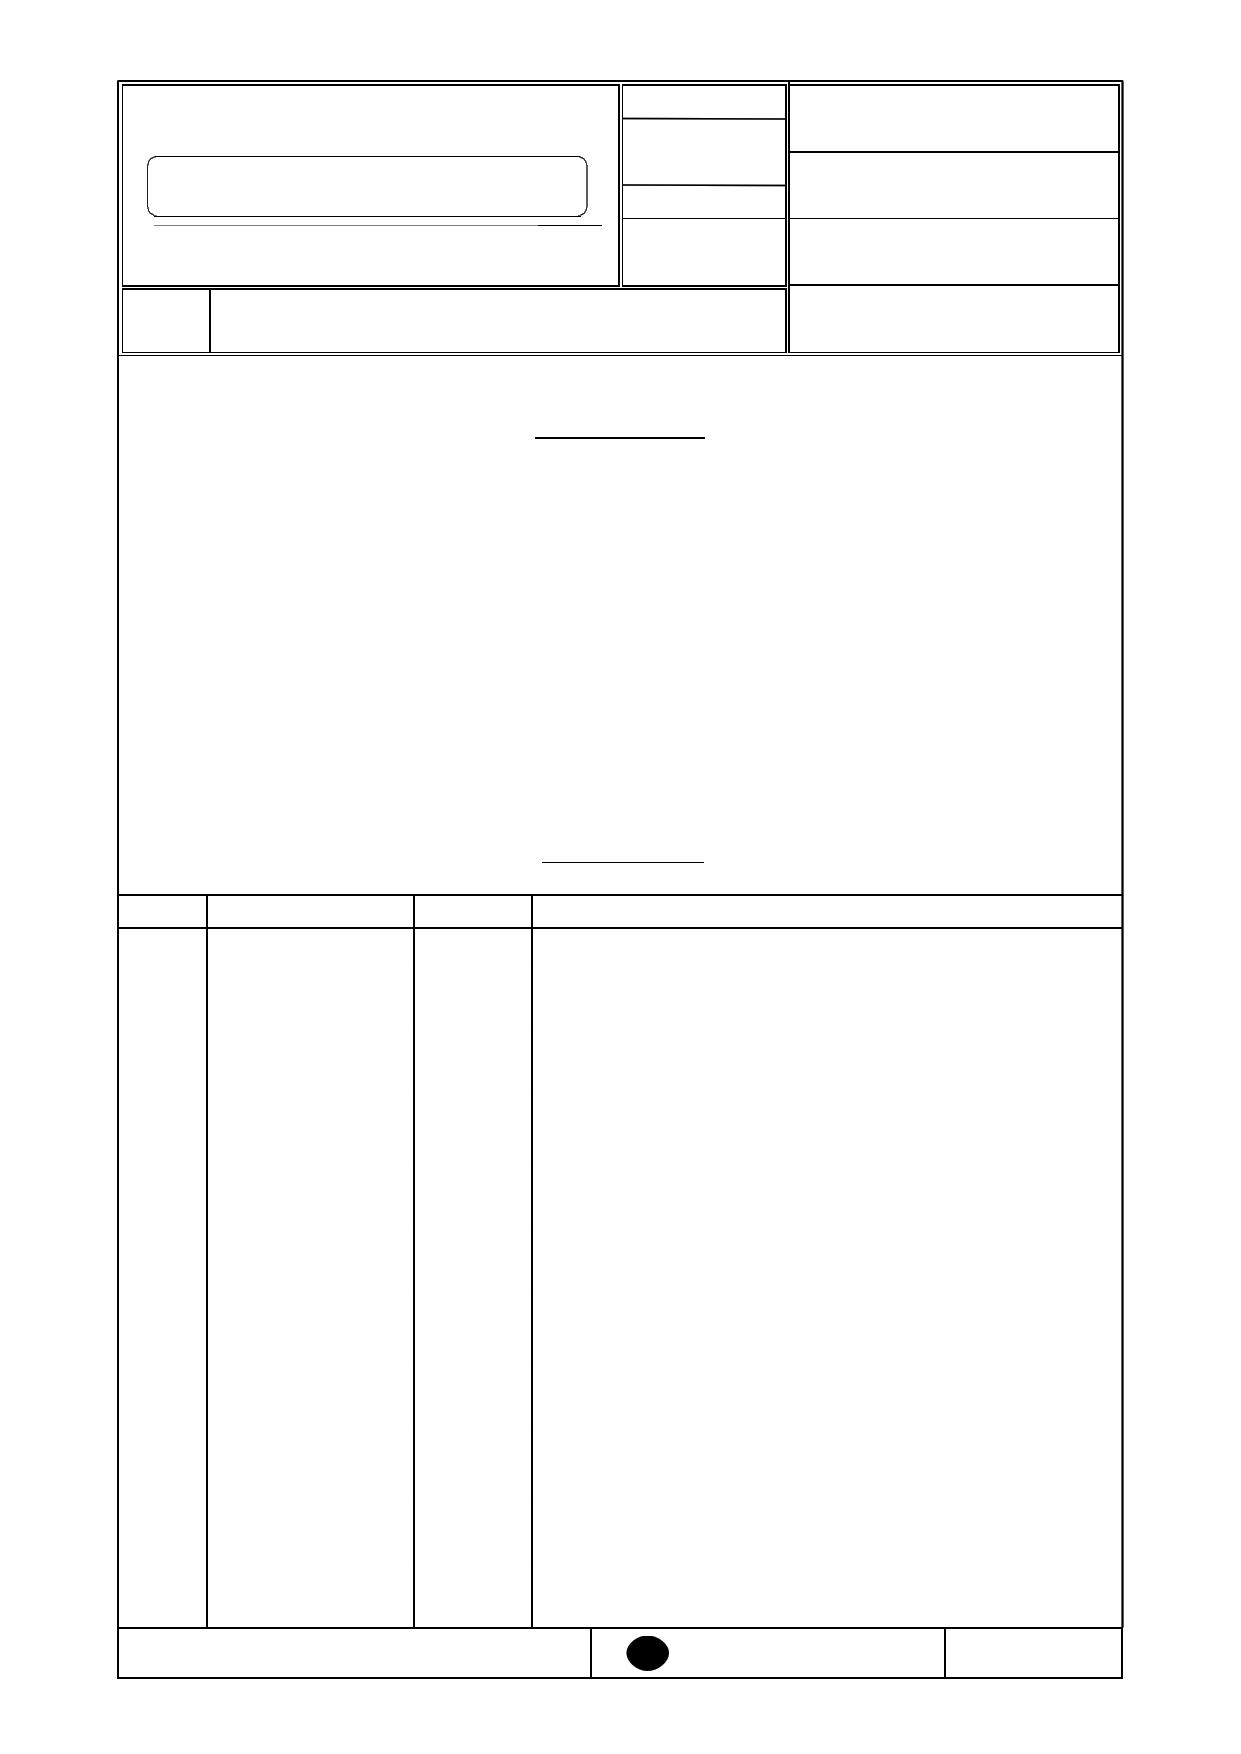 T-51686GD049H-FW-AA دیتاشیت PDF